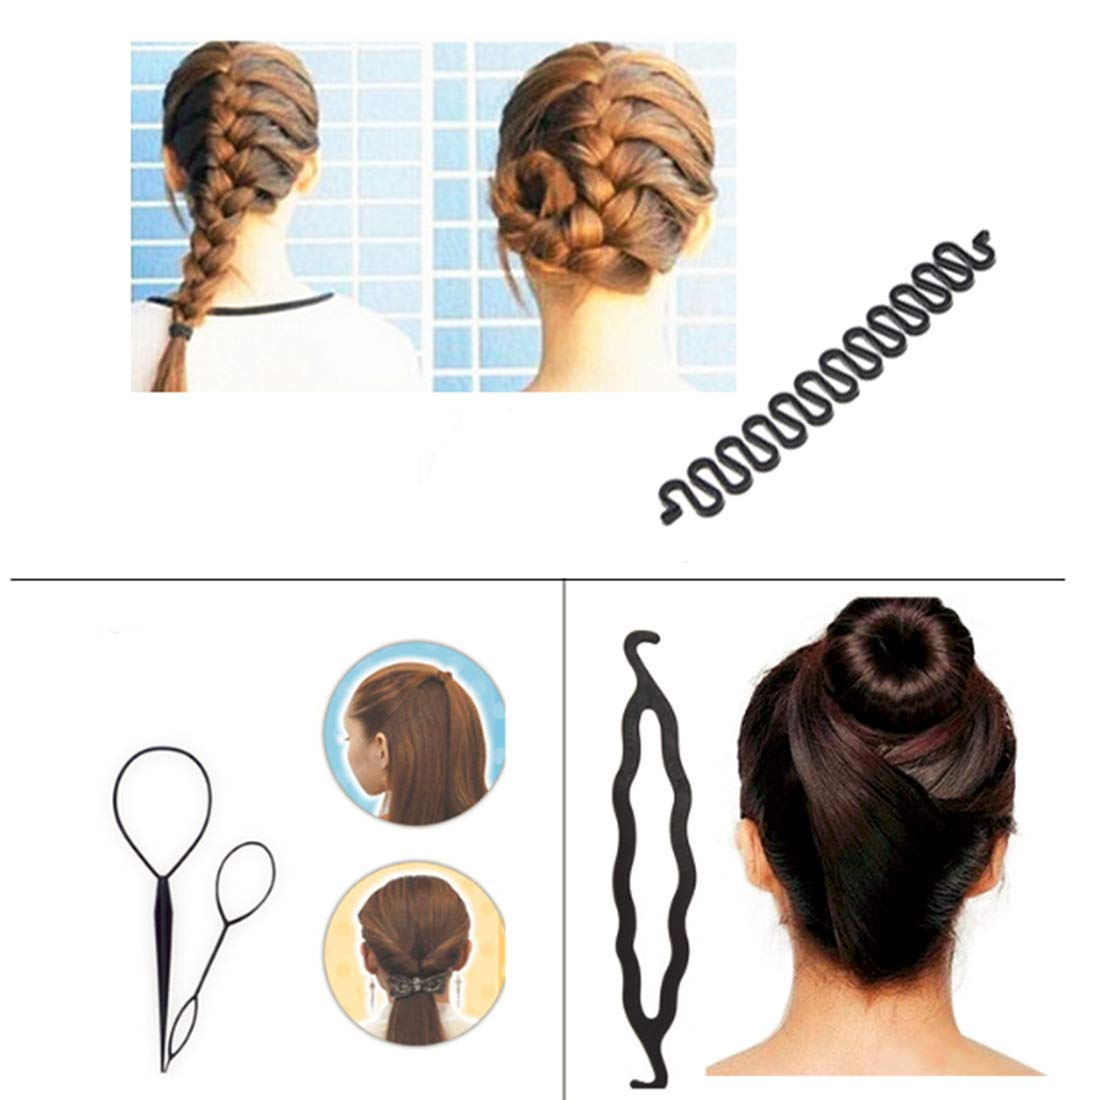 19 Pcs Hair Braiding Tool, DIY Hair Styling Tool Kit Updo Ponytail Maker Accessories Topsy Hair Braid Kit, Coloure, (19 Pairs Topsy Tail) … : Beauty